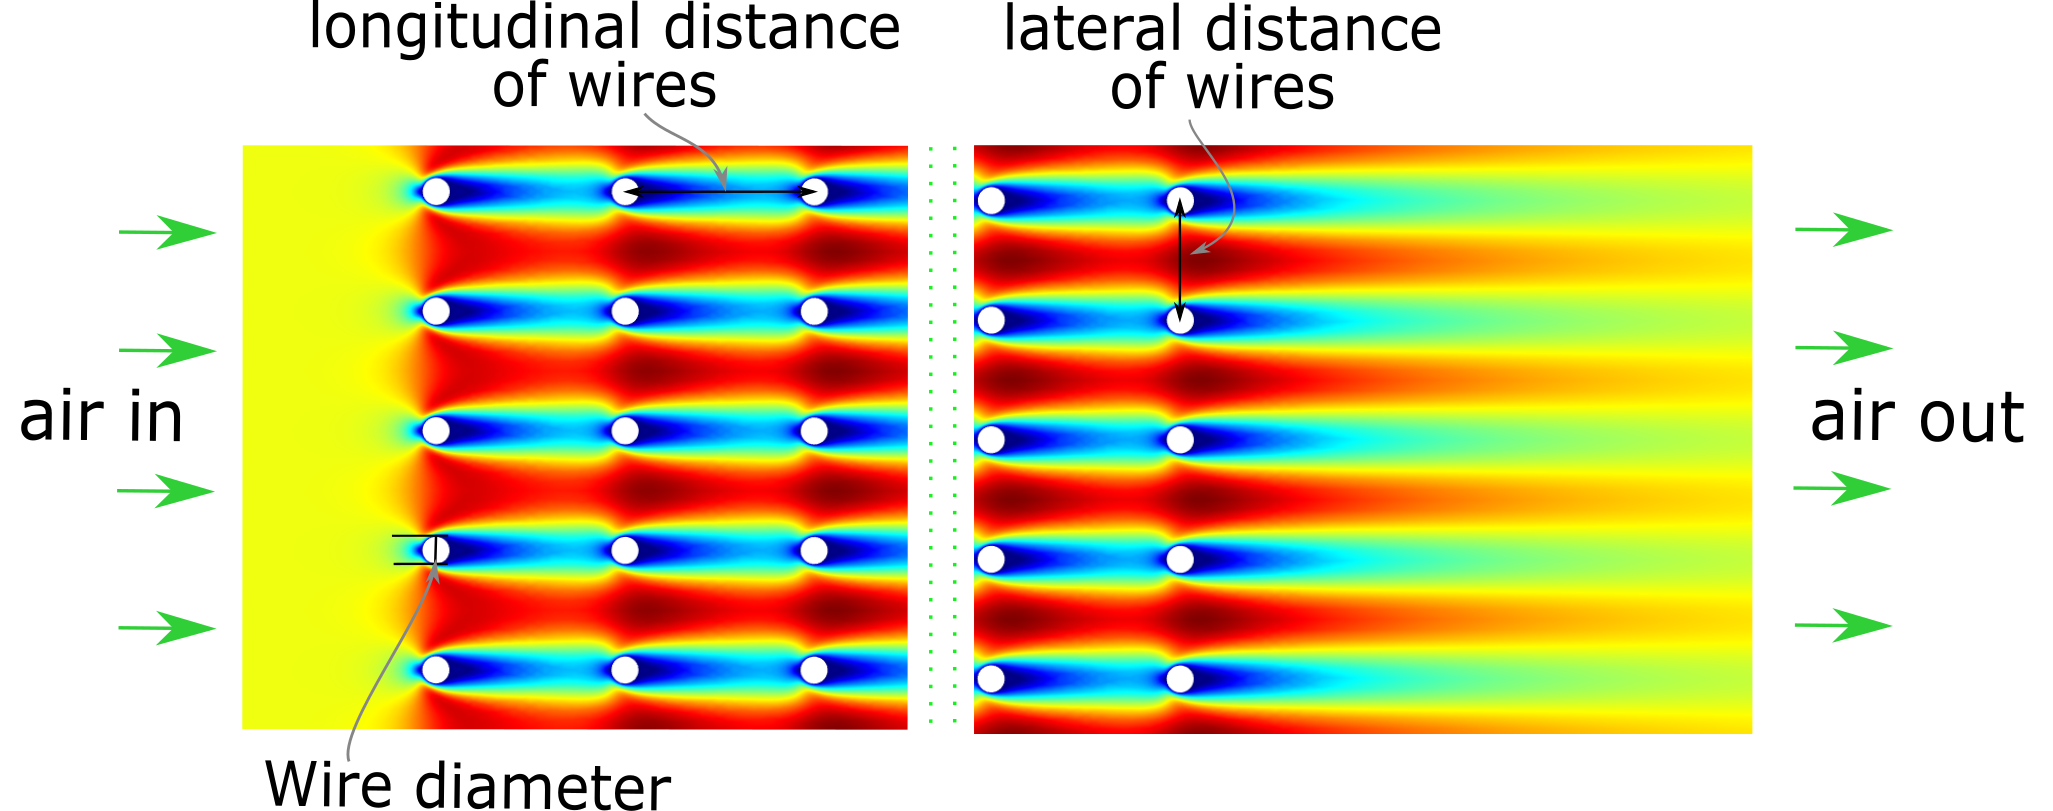 Querschnitt durch einen Drahtstruktur-Wärmeübertrager